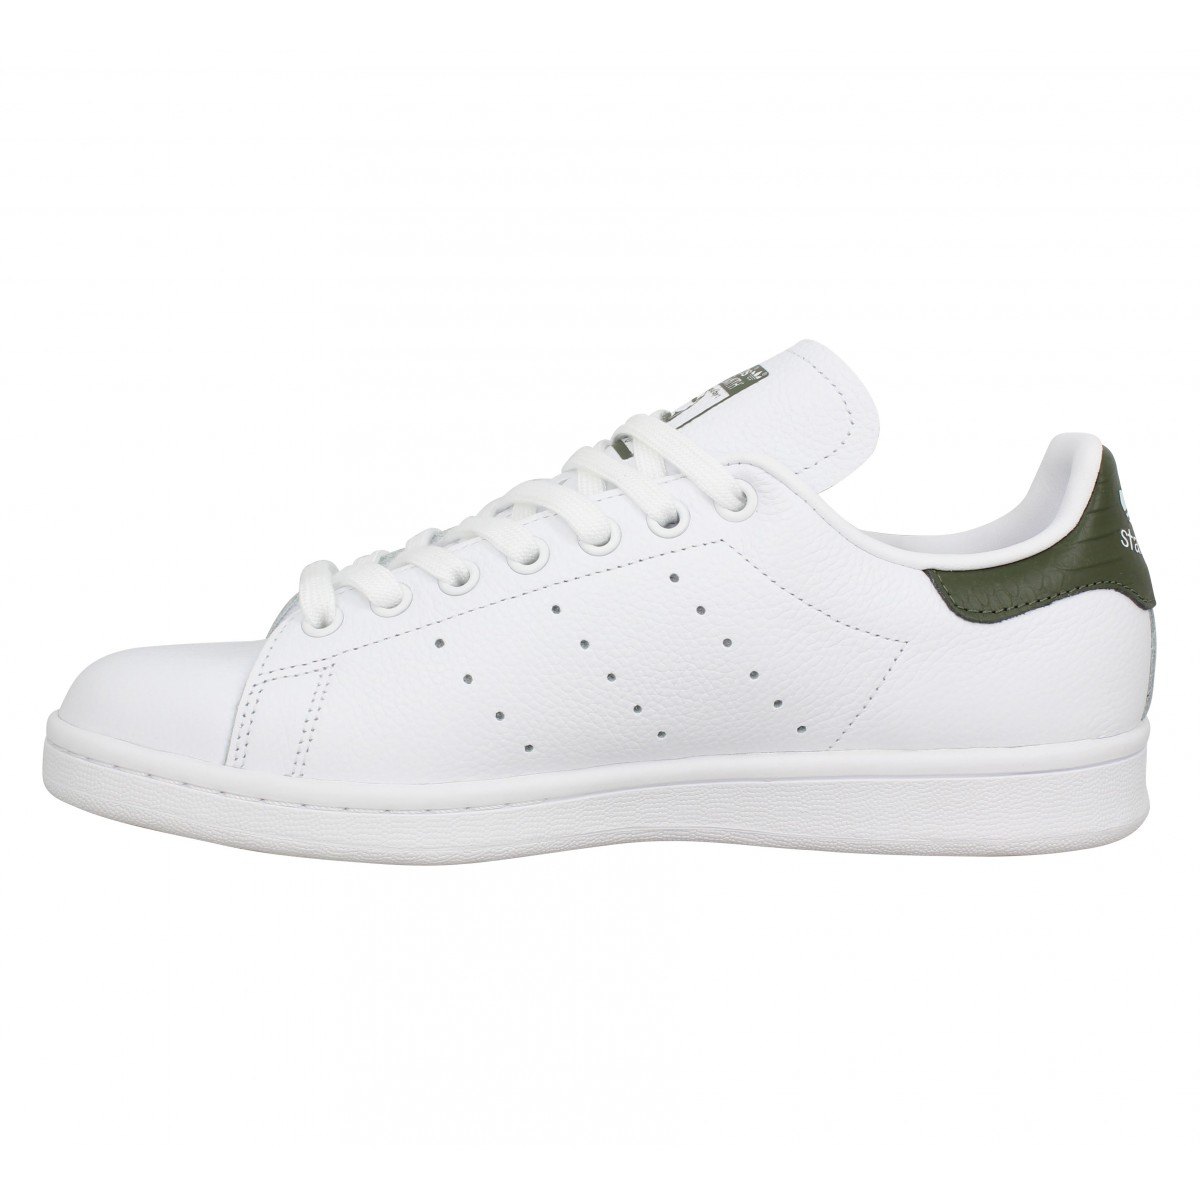 Chaussures Adidas stan smith cuir blanc kaki femme homme